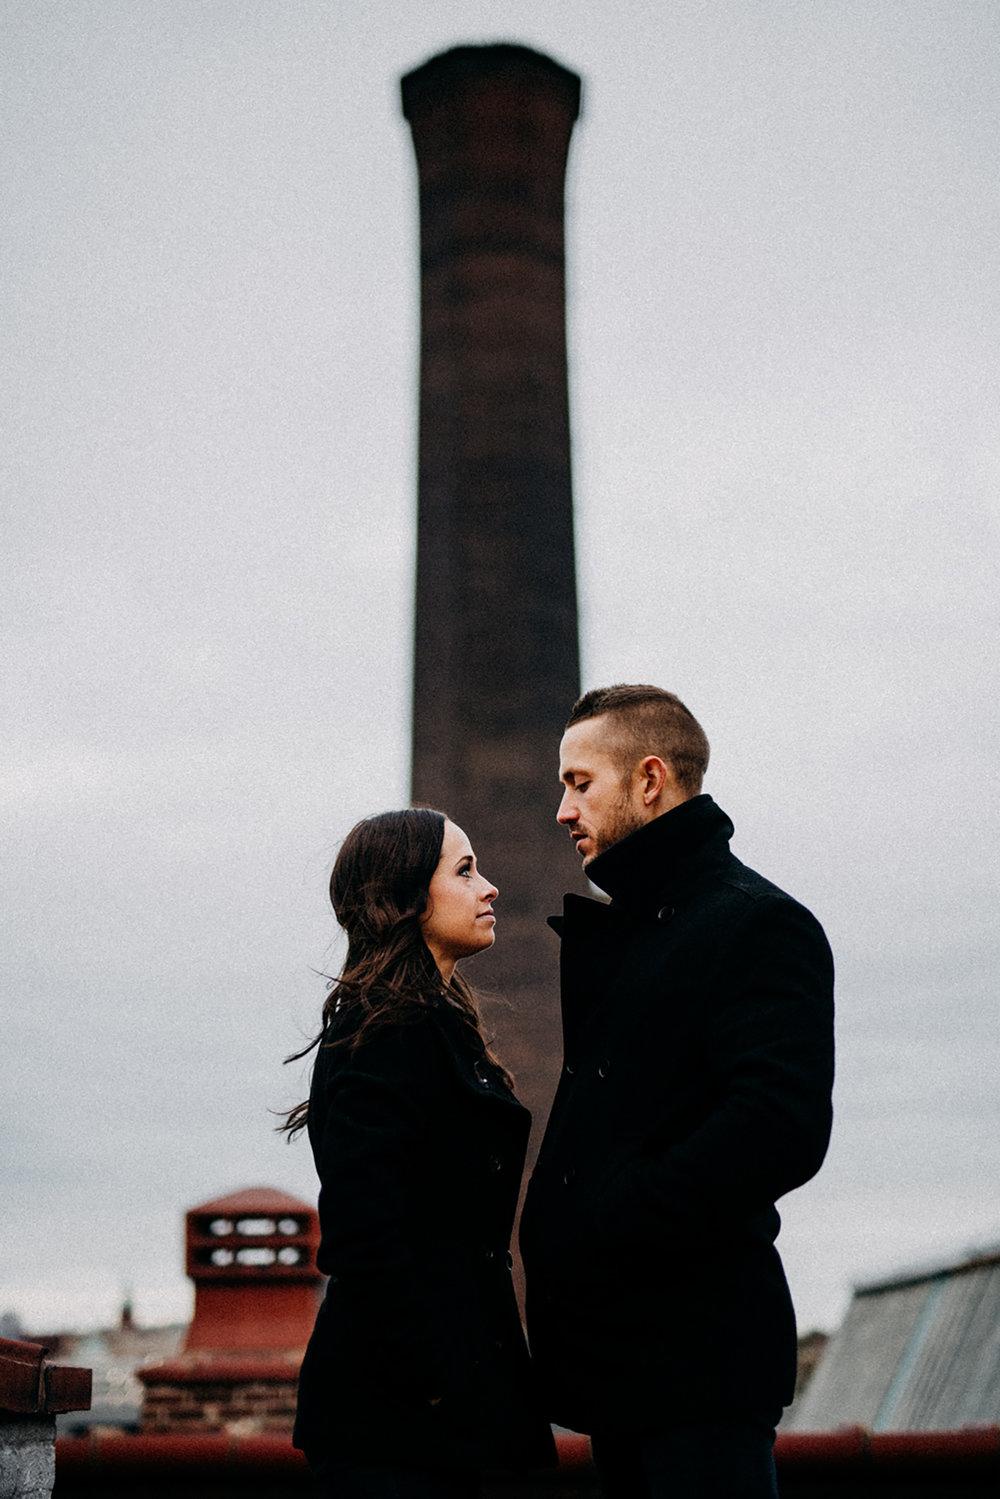 couples33.jpg